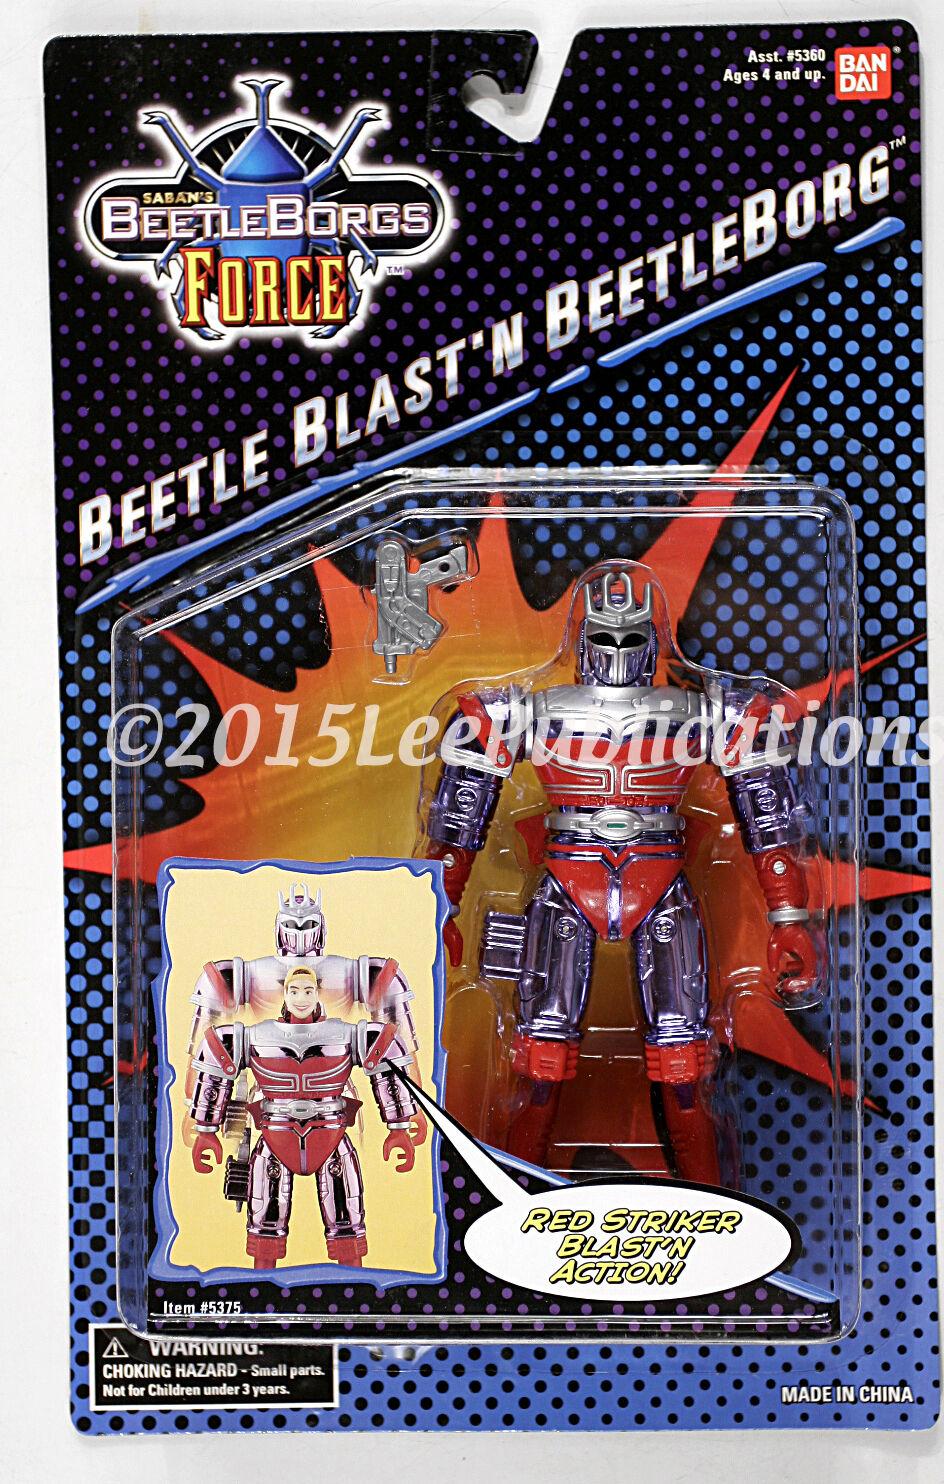 Saban's Saban's Saban's BeetleBorg Beetle Blast'n Beetleborgs Force Ban Dai MOSC rare 236cde